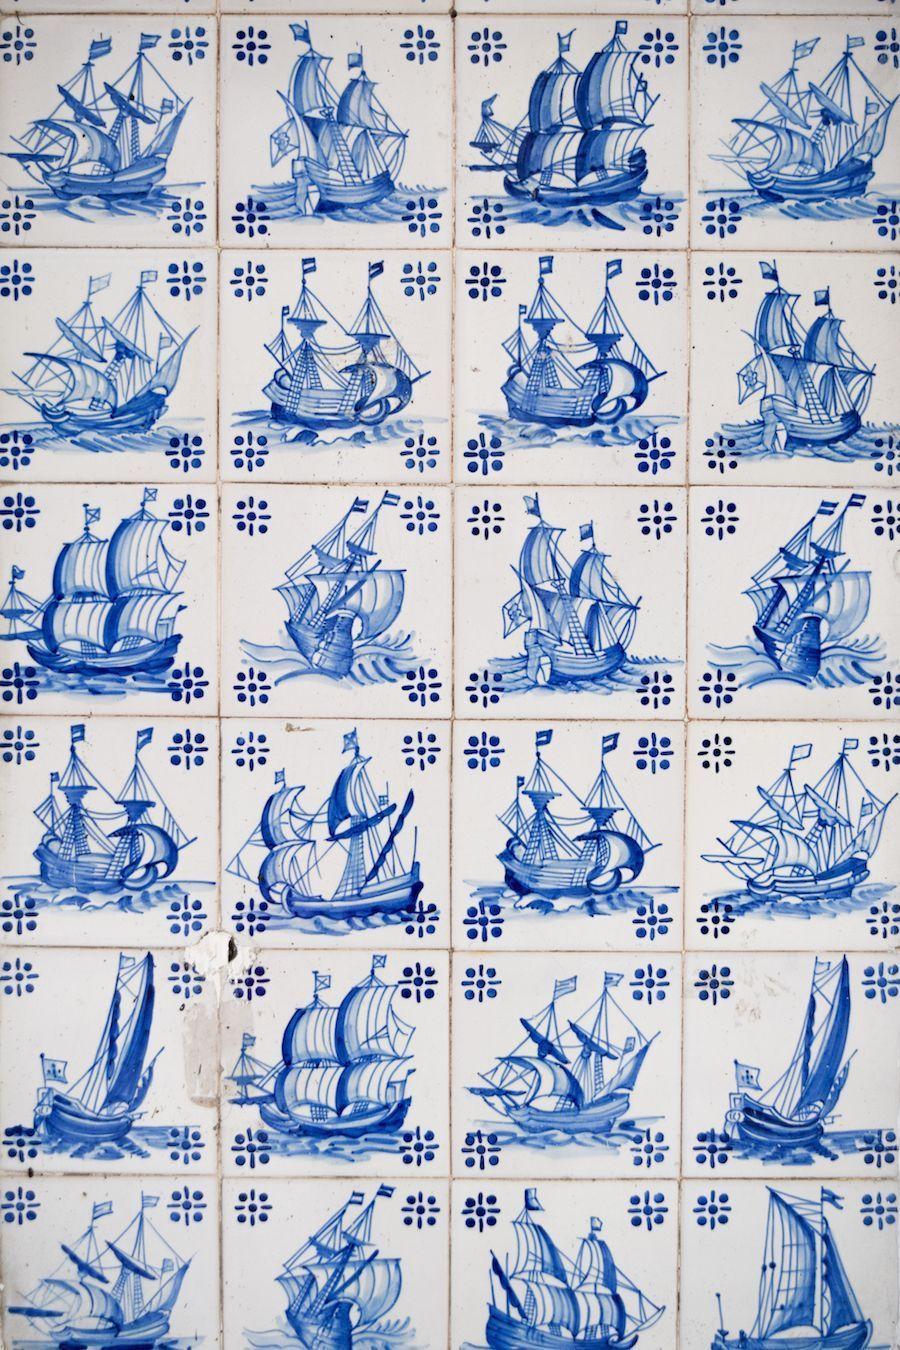 Gorgeous blue ship tiles in Lisbon Portugal